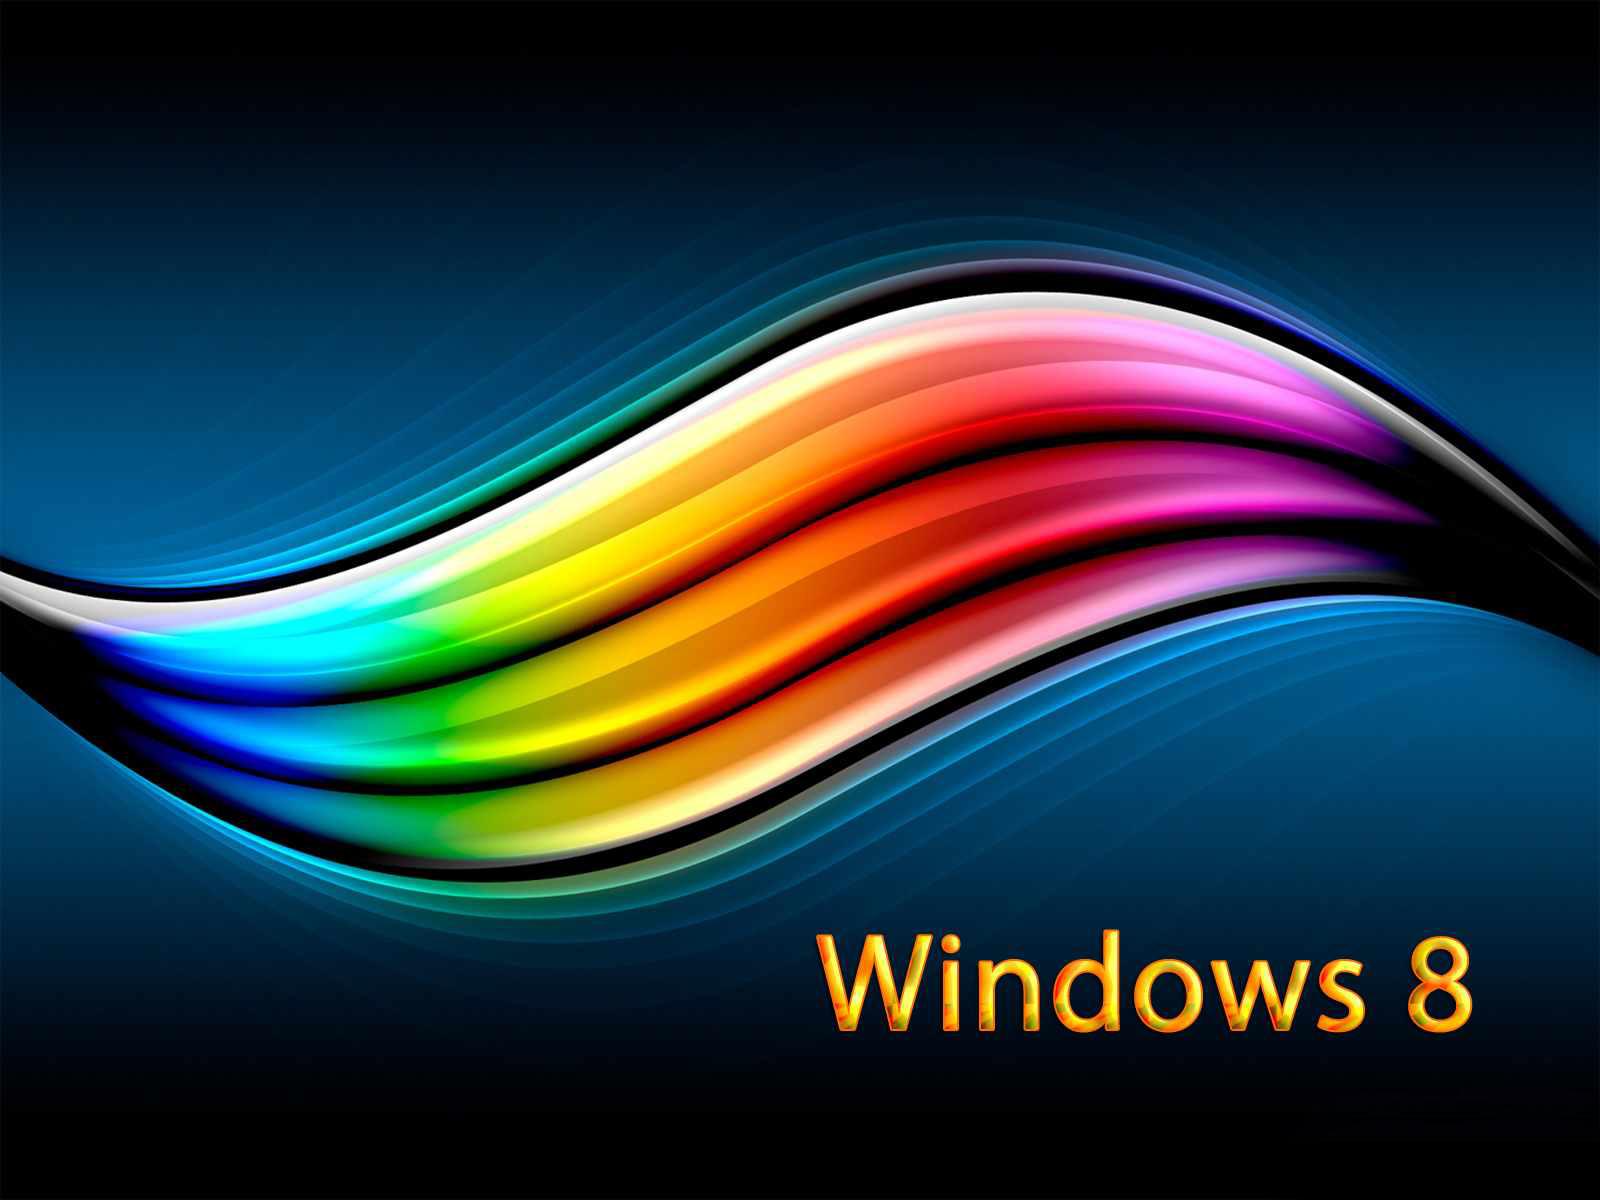 Windows 8 New Wallpaper Hd For Desktop Free 1080p Download